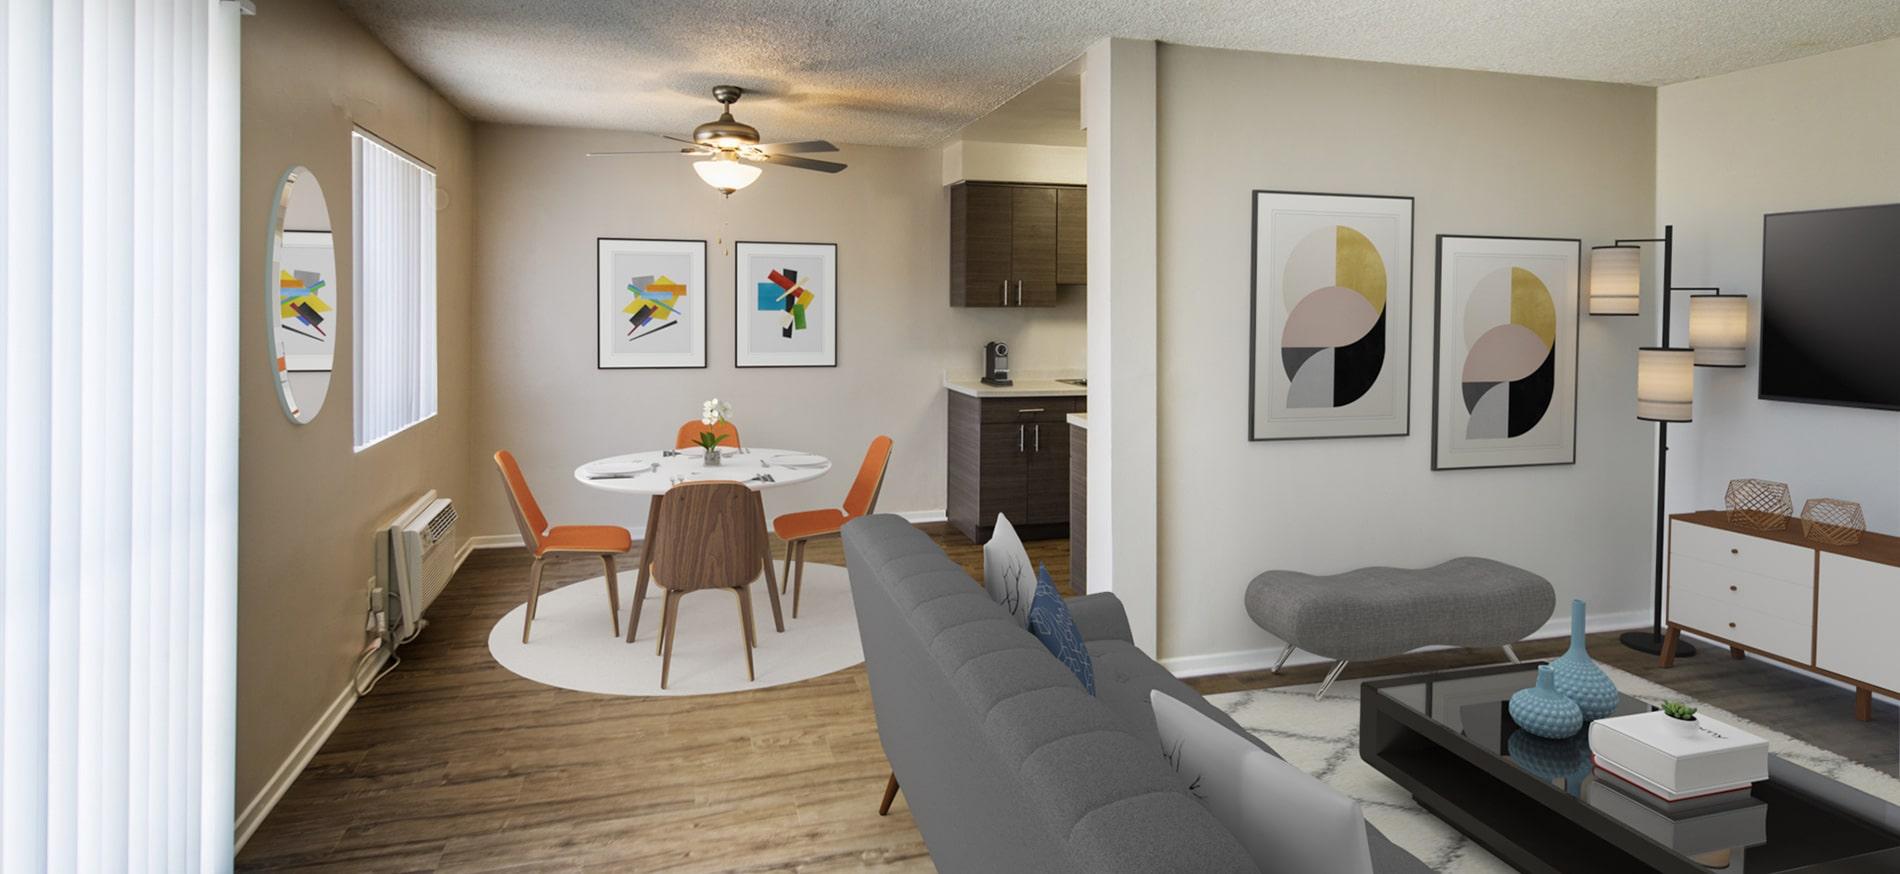 Rosebeach Apartments In La Mirada Udr Apartments